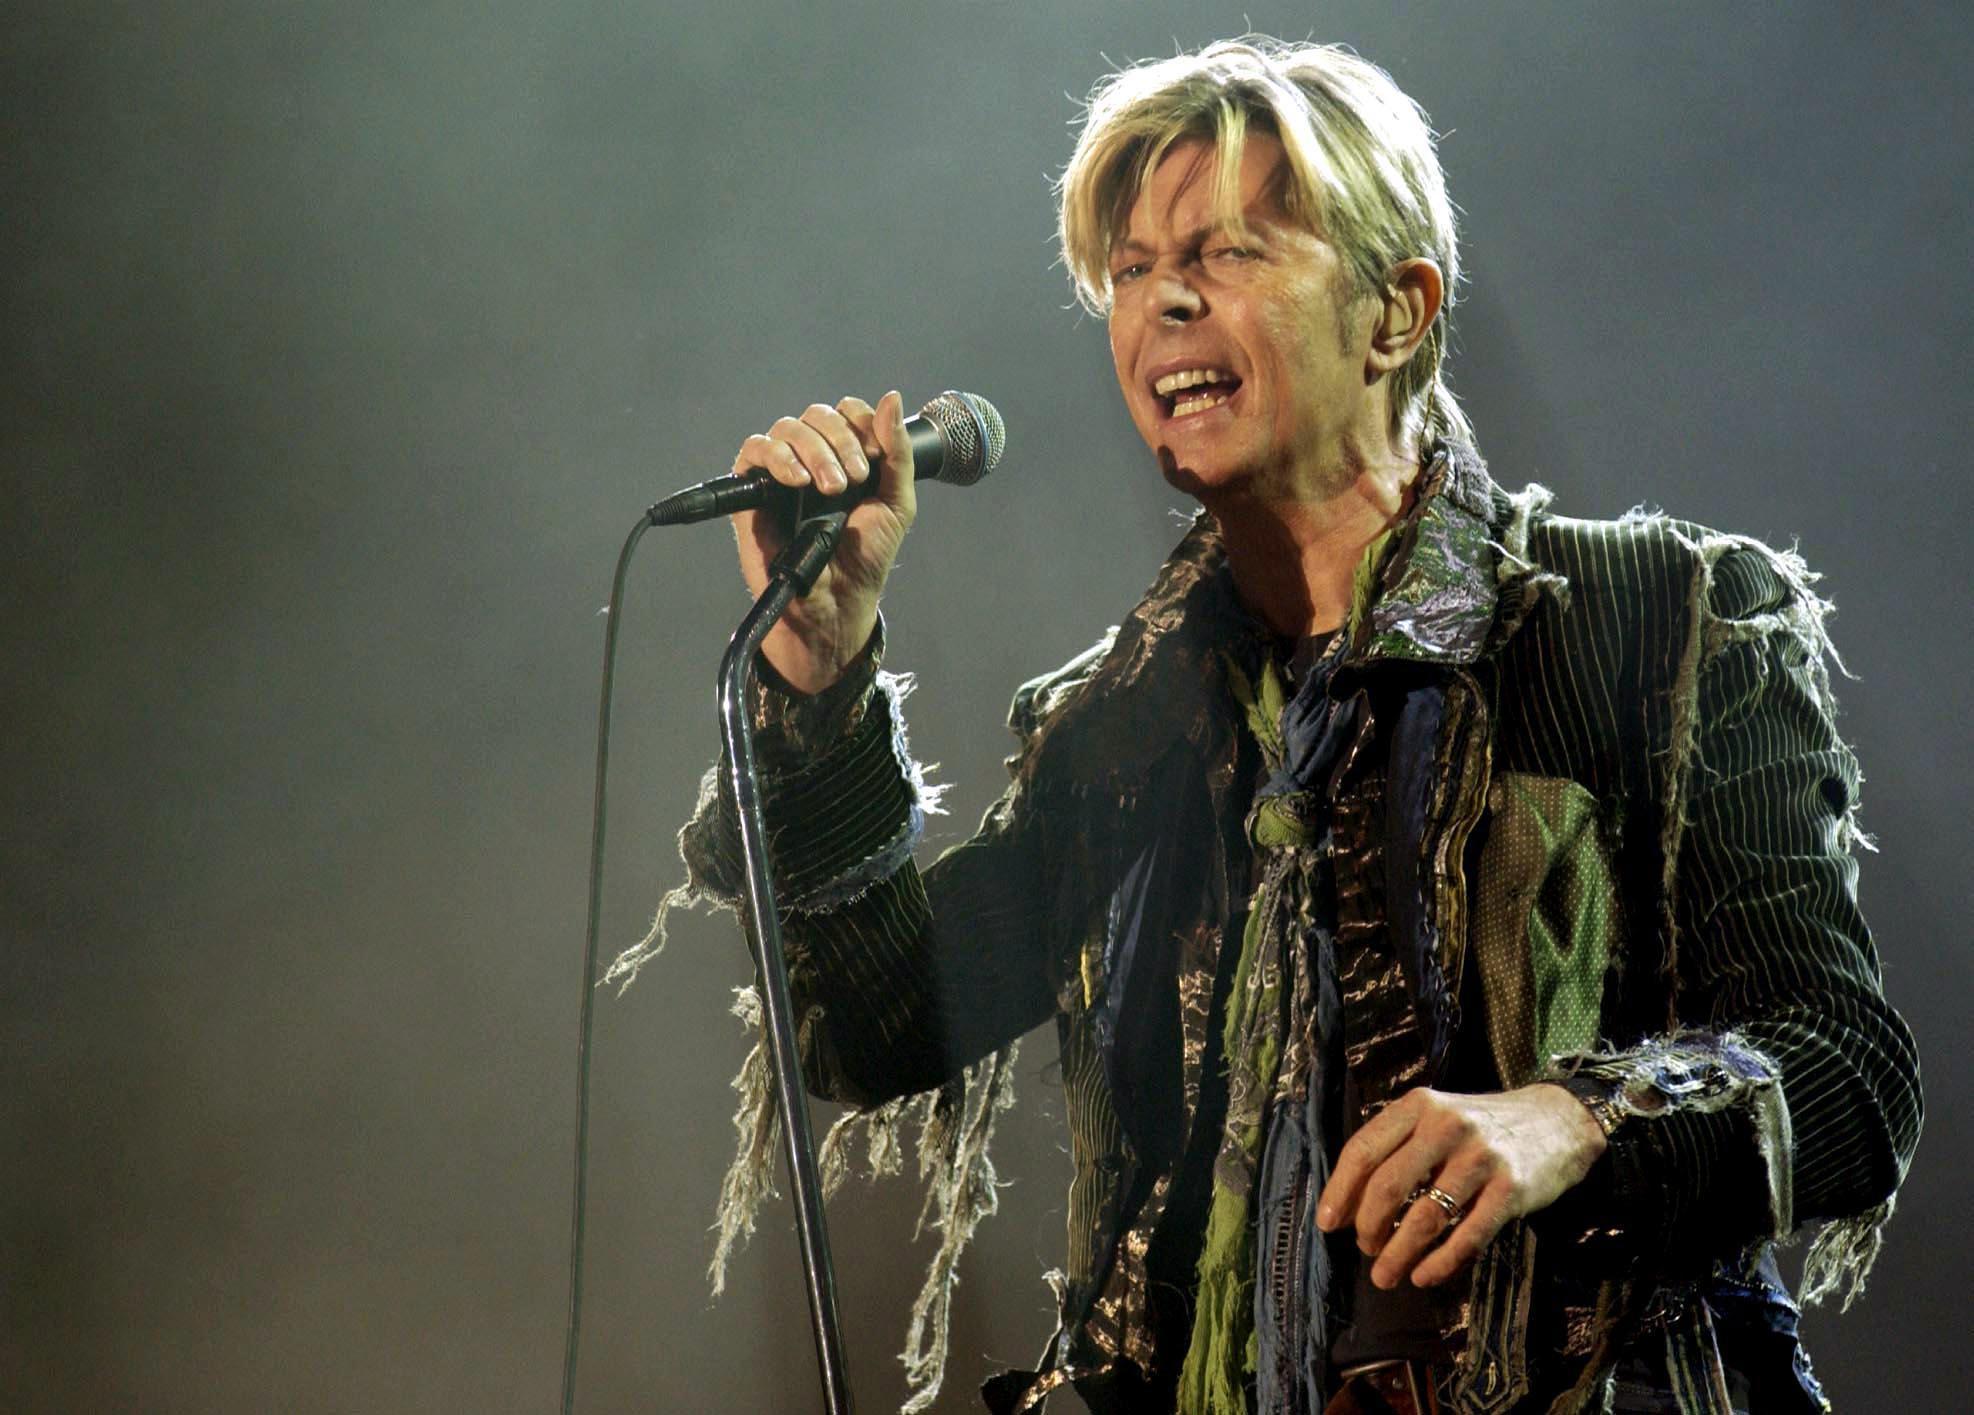 David Bowie Anniversary Night su VH1: serata speciale il 10 gennaio 2017